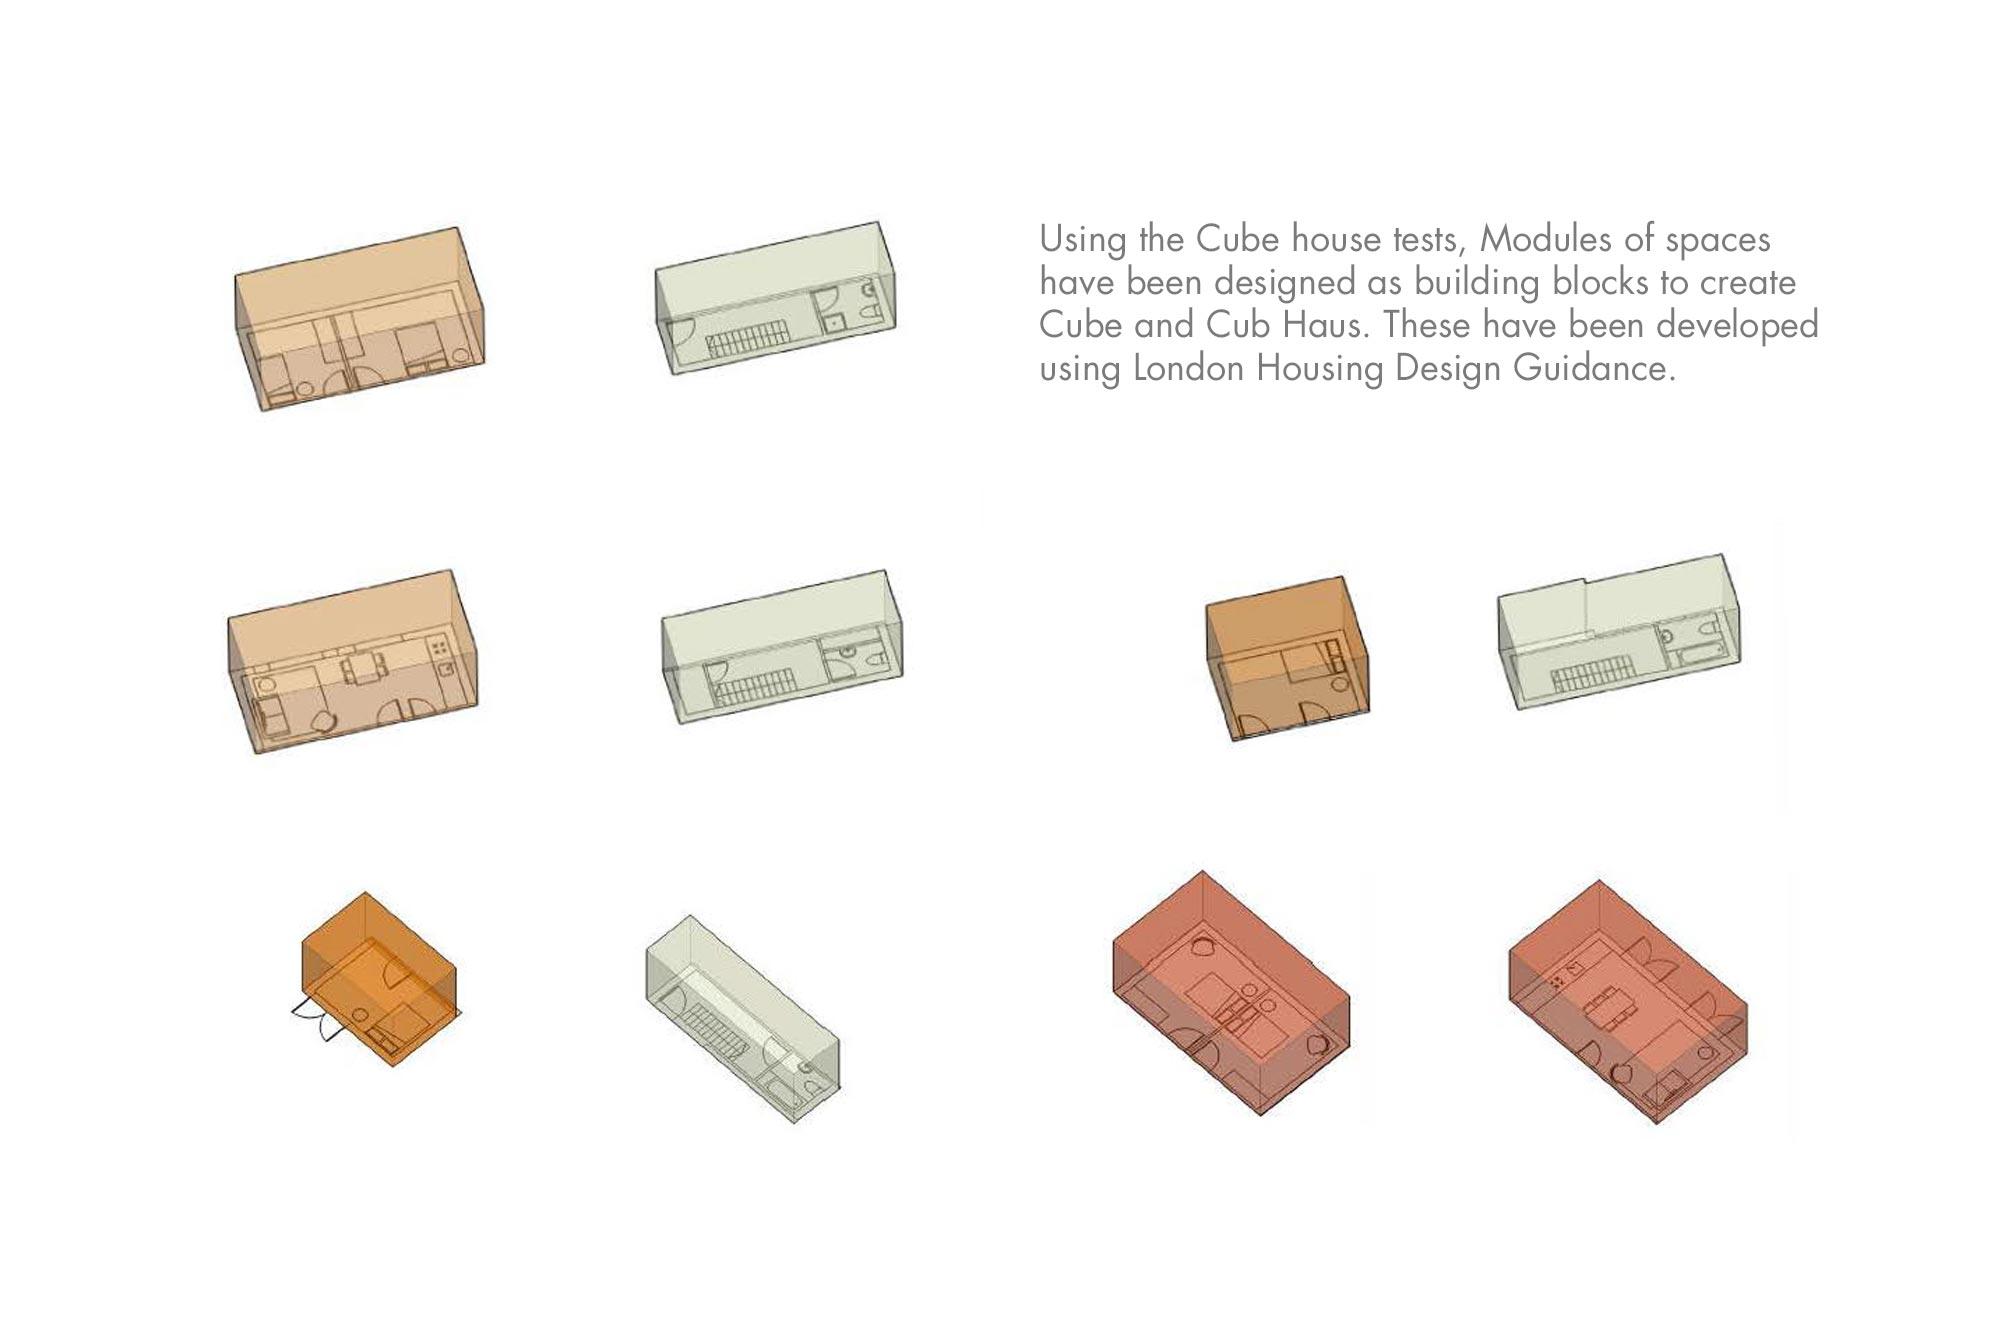 cube-haus-adjaye-associates-architects-cs-2000px-06